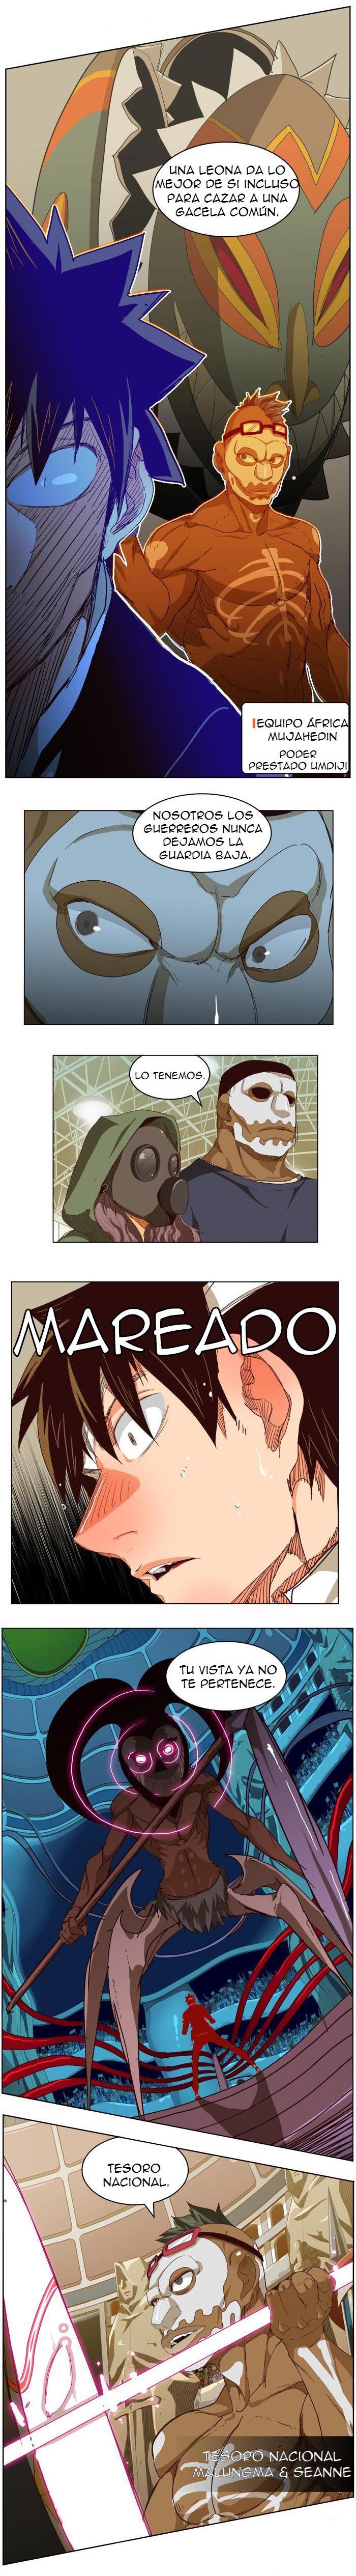 http://c5.ninemanga.com/es_manga/37/485/454637/b84a25d15d9d44f58640a485c1387df8.jpg Page 4